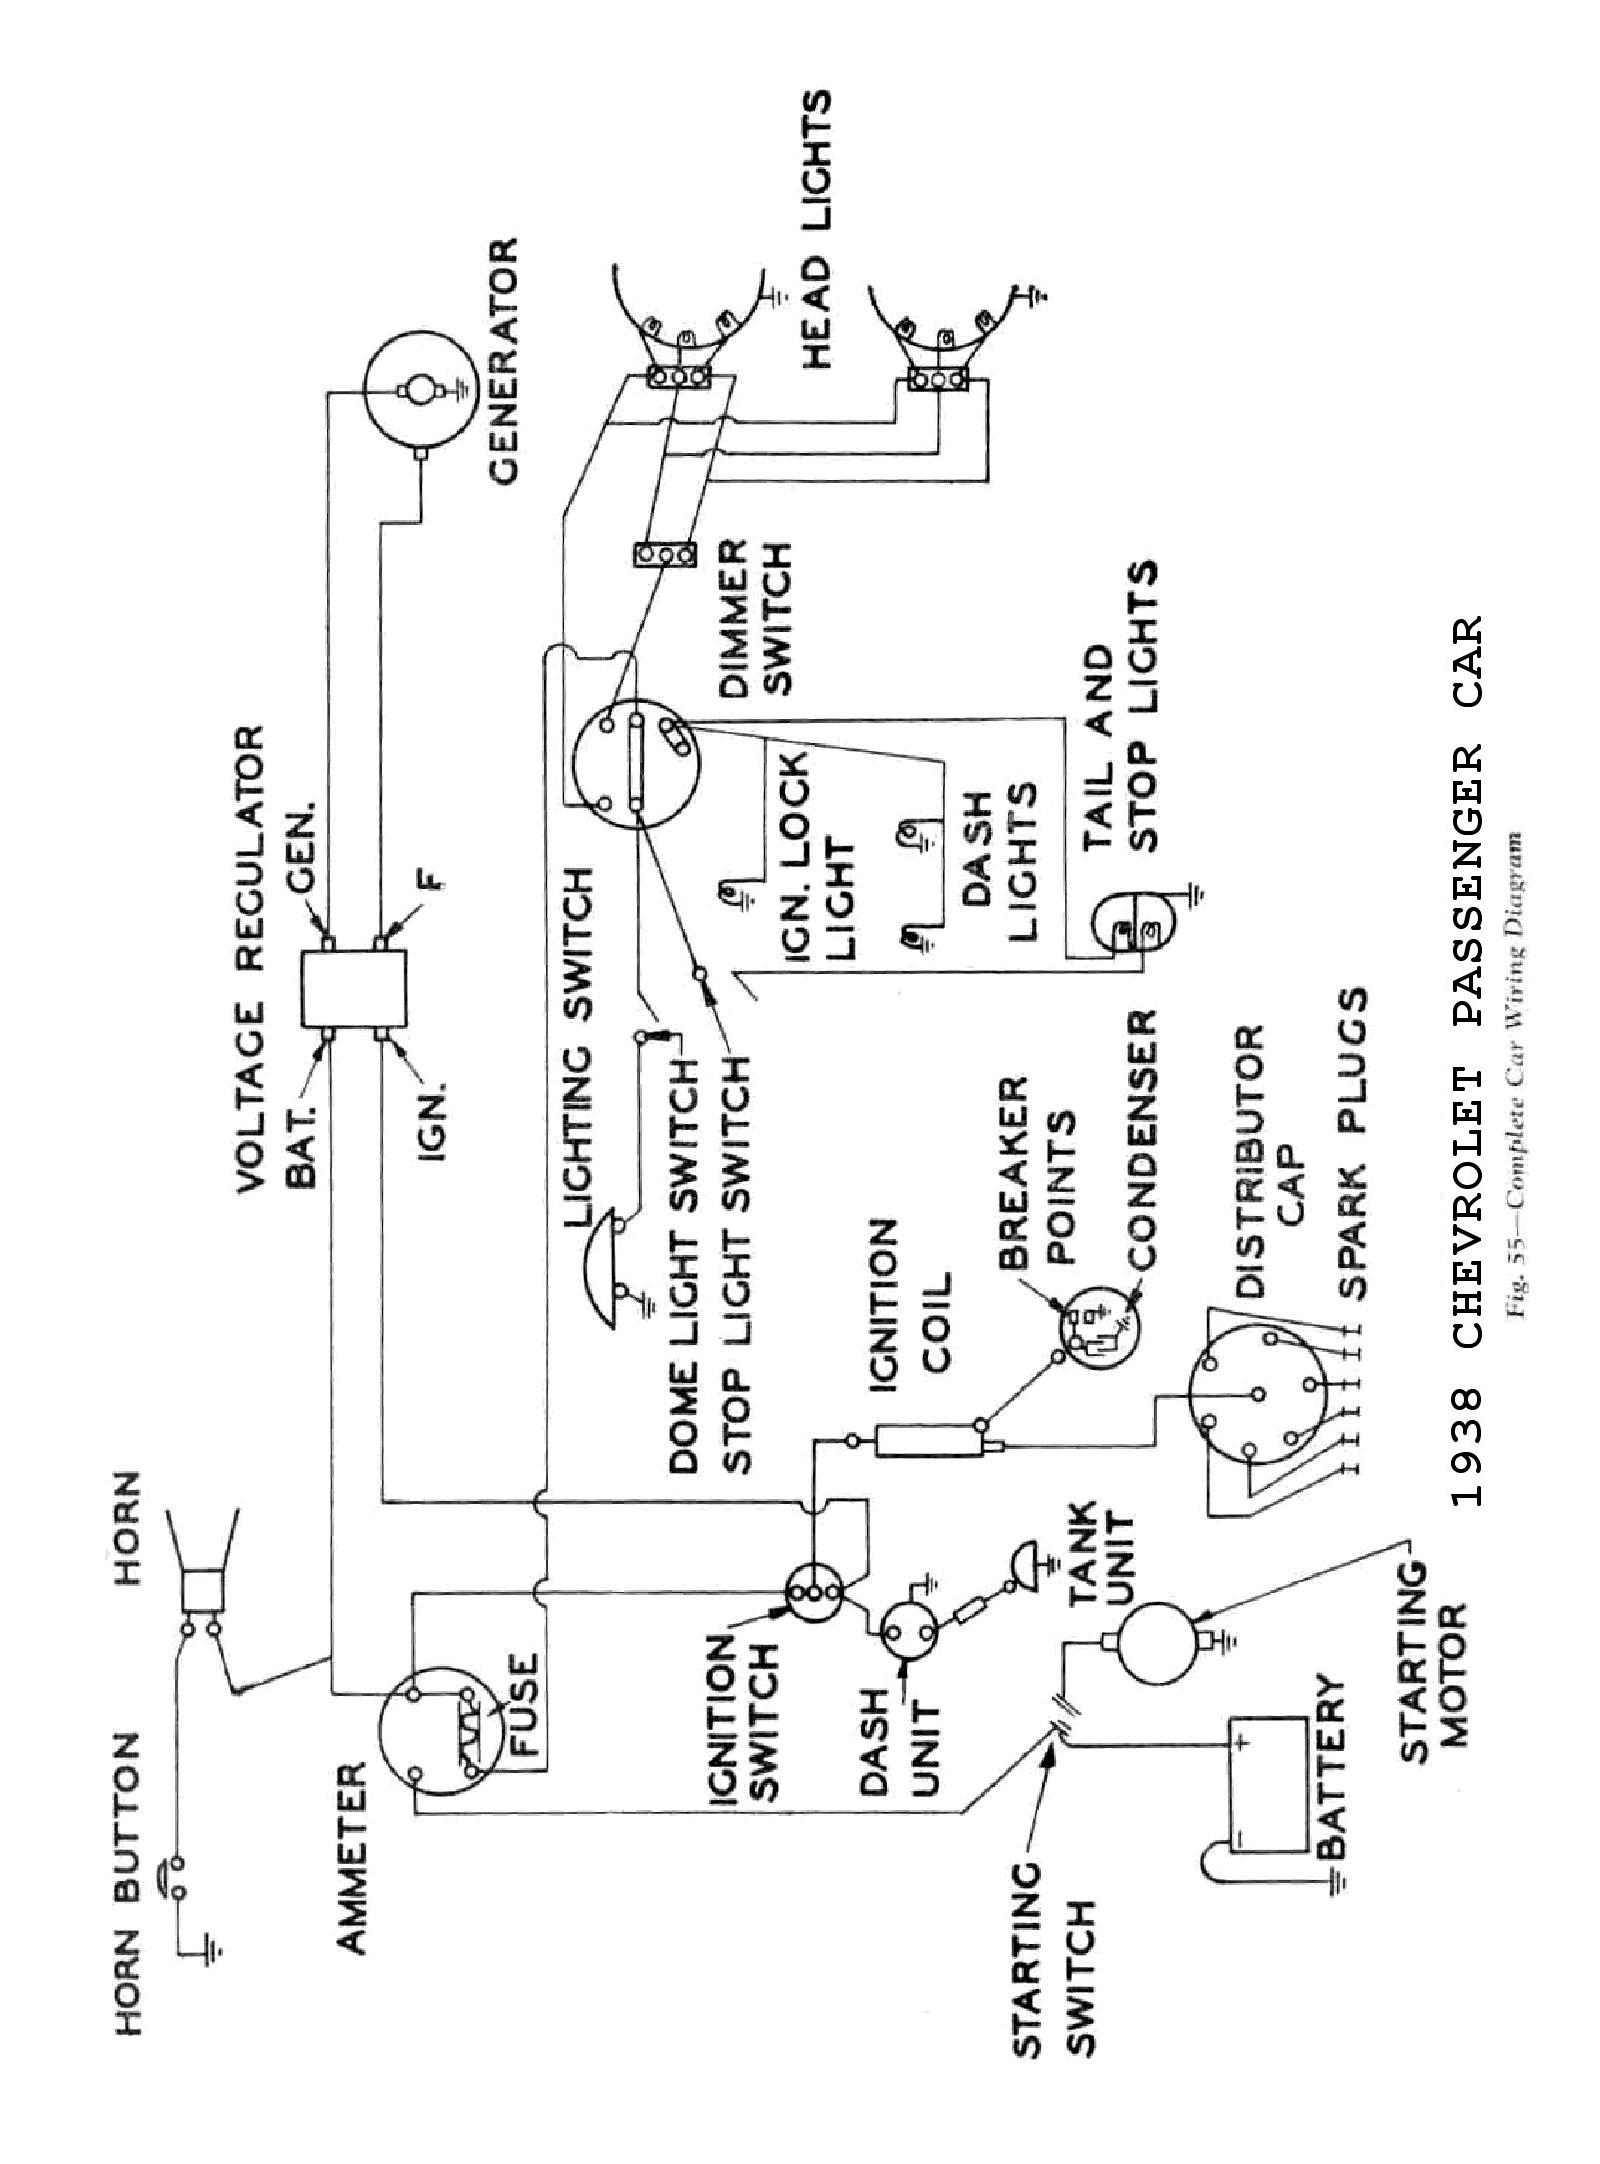 Cool 57 Chevy Ignition Wiring Diagram Basic Electronics Wiring Diagram Wiring Cloud Xortanetembamohammedshrineorg